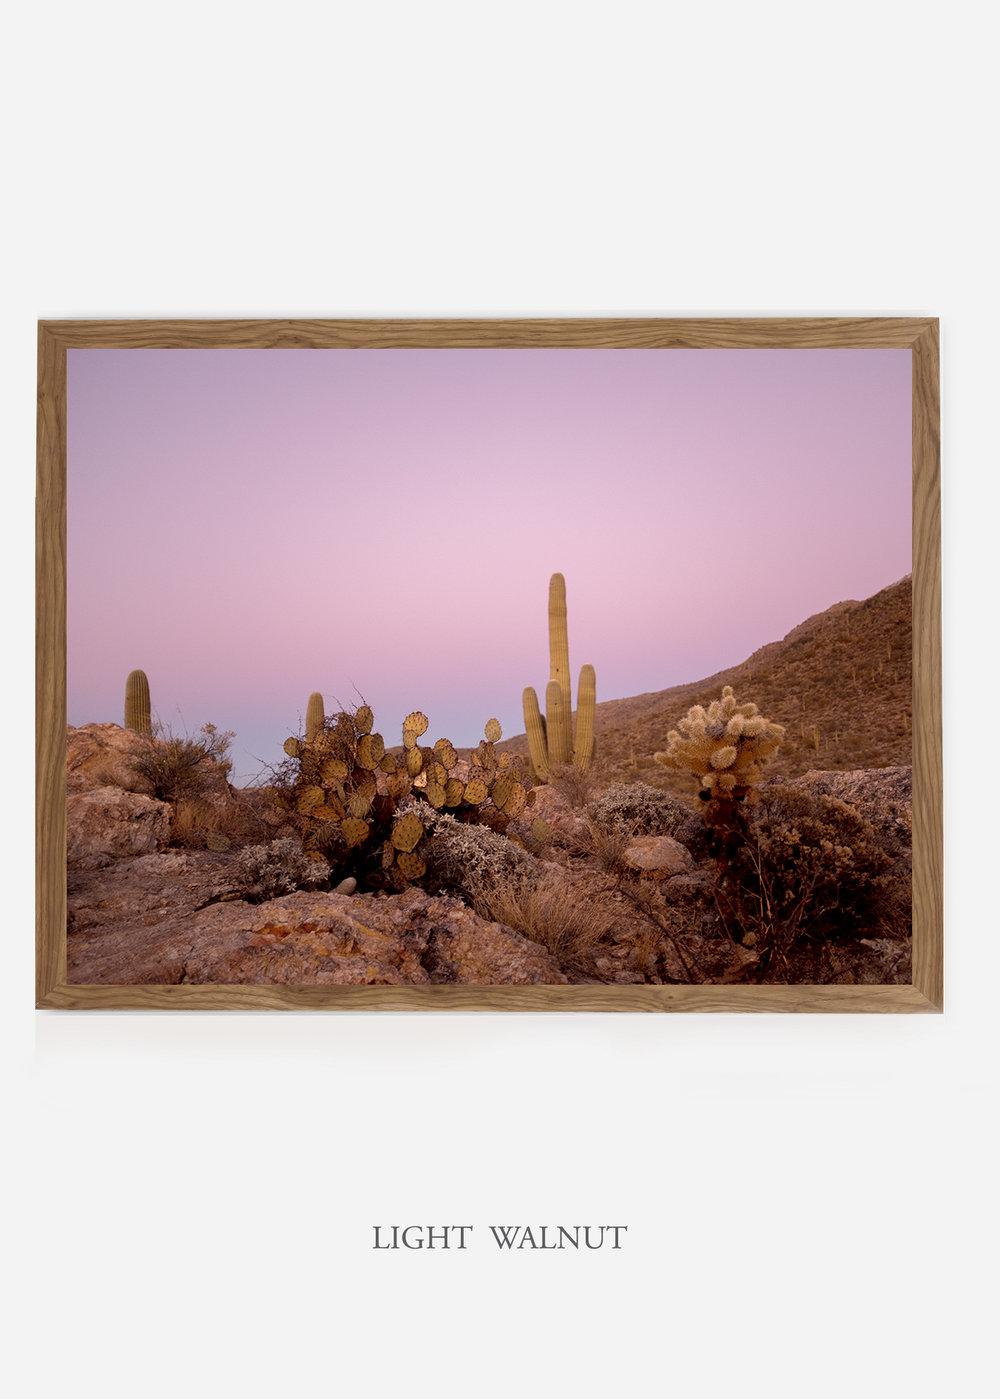 nomat_lightwalnutframe-saguaroNo.9-wildercalifornia-art-wallart-cactusprint-homedecor-prints-arizona-botanical-artwork-interiordesign.jpg